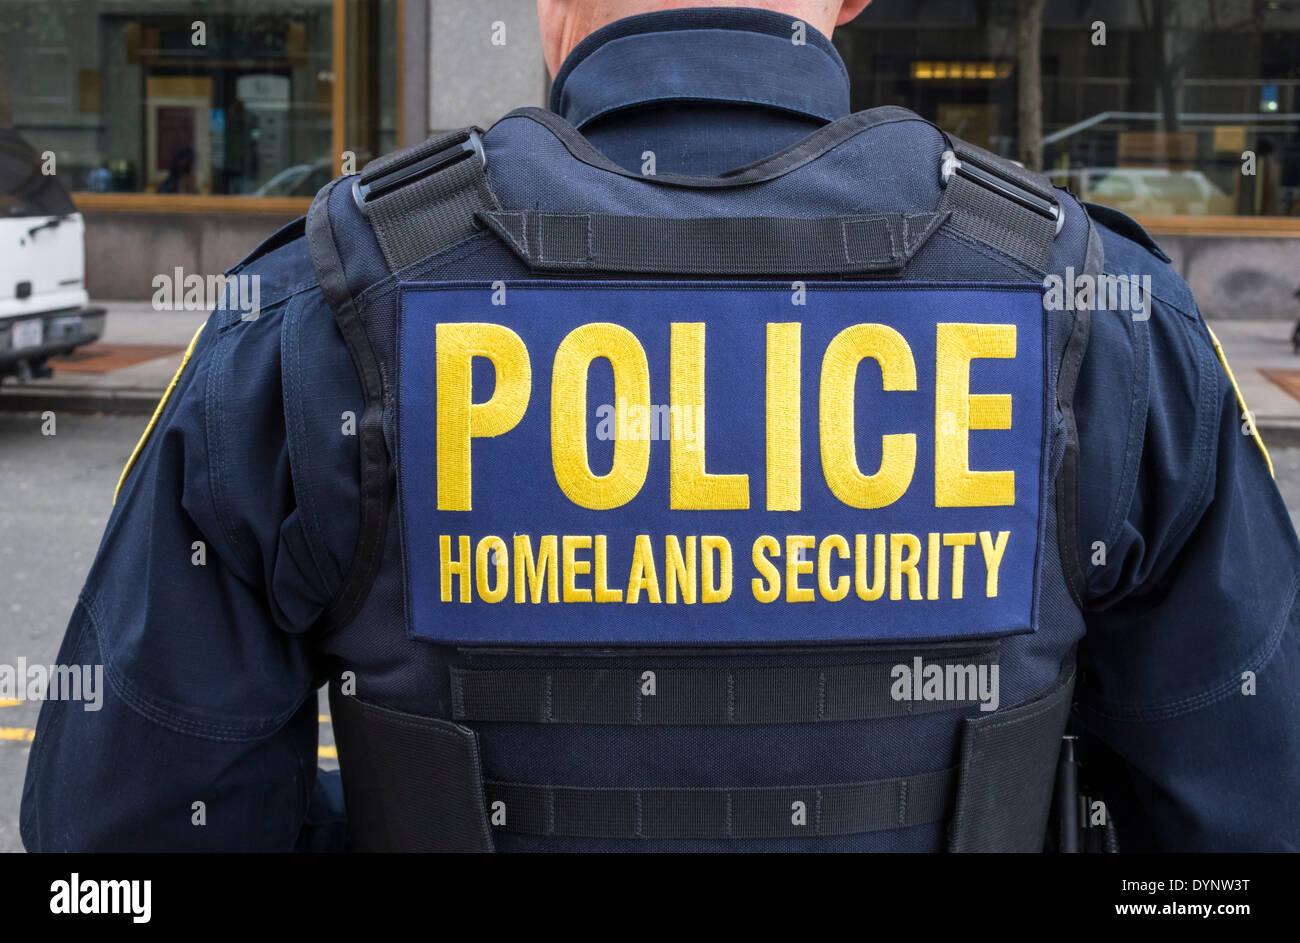 New York City police officer on Homeland Security duty Stock Photo